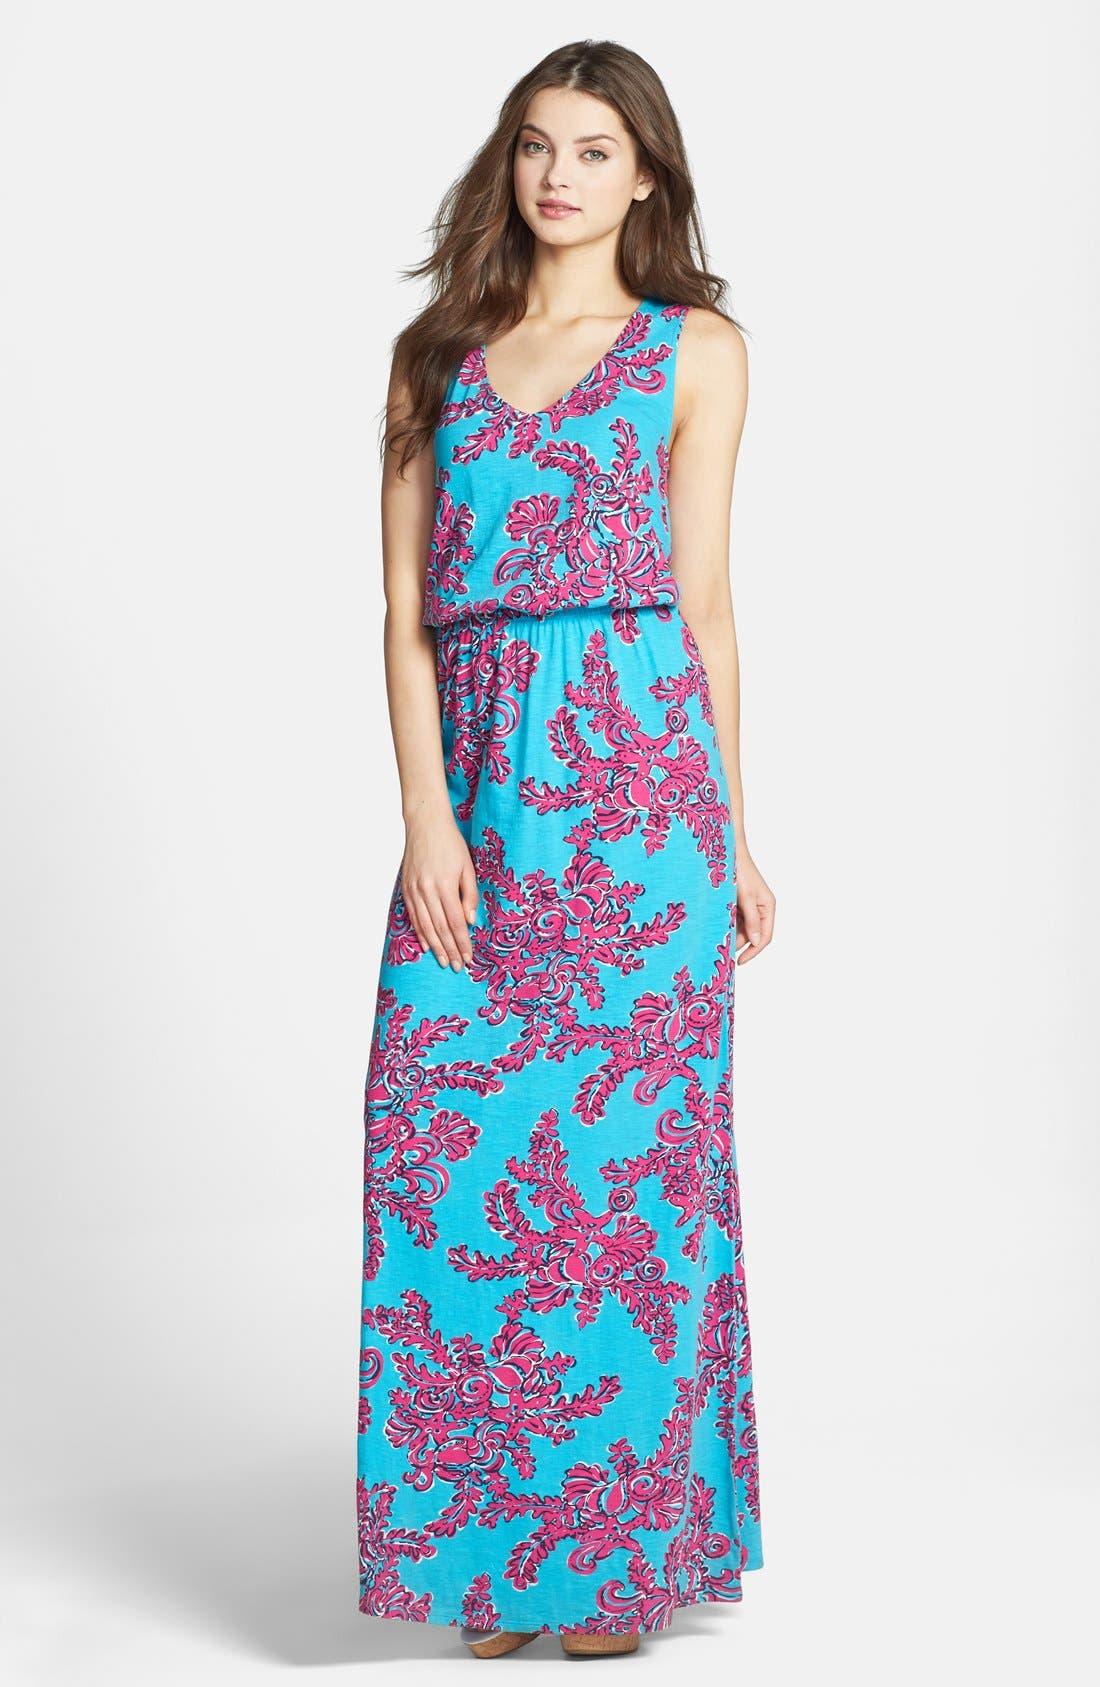 Alternate Image 1 Selected - Lilly Pulitzer® Print Blouson Cotton Maxi Dress